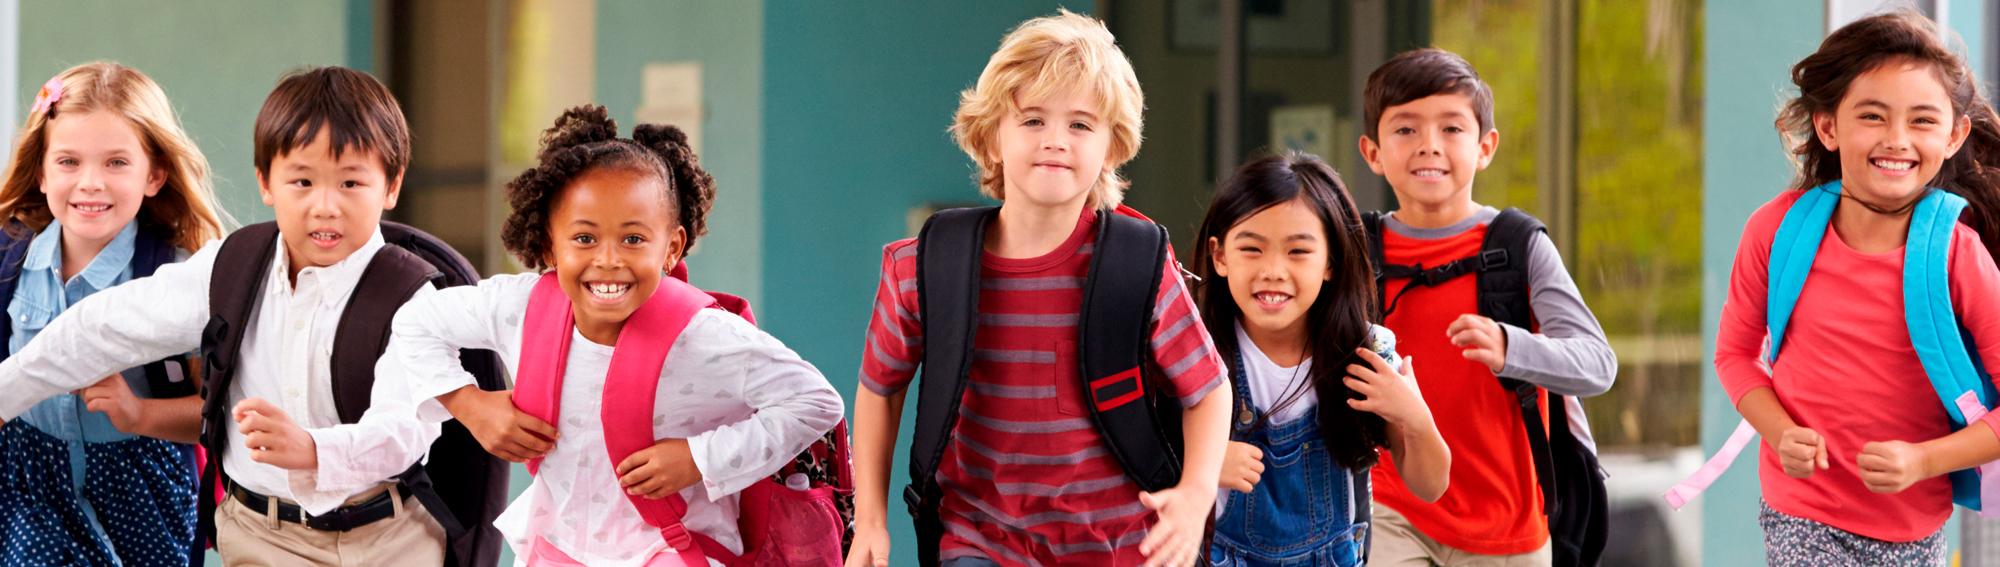 students wearing backpacks, running